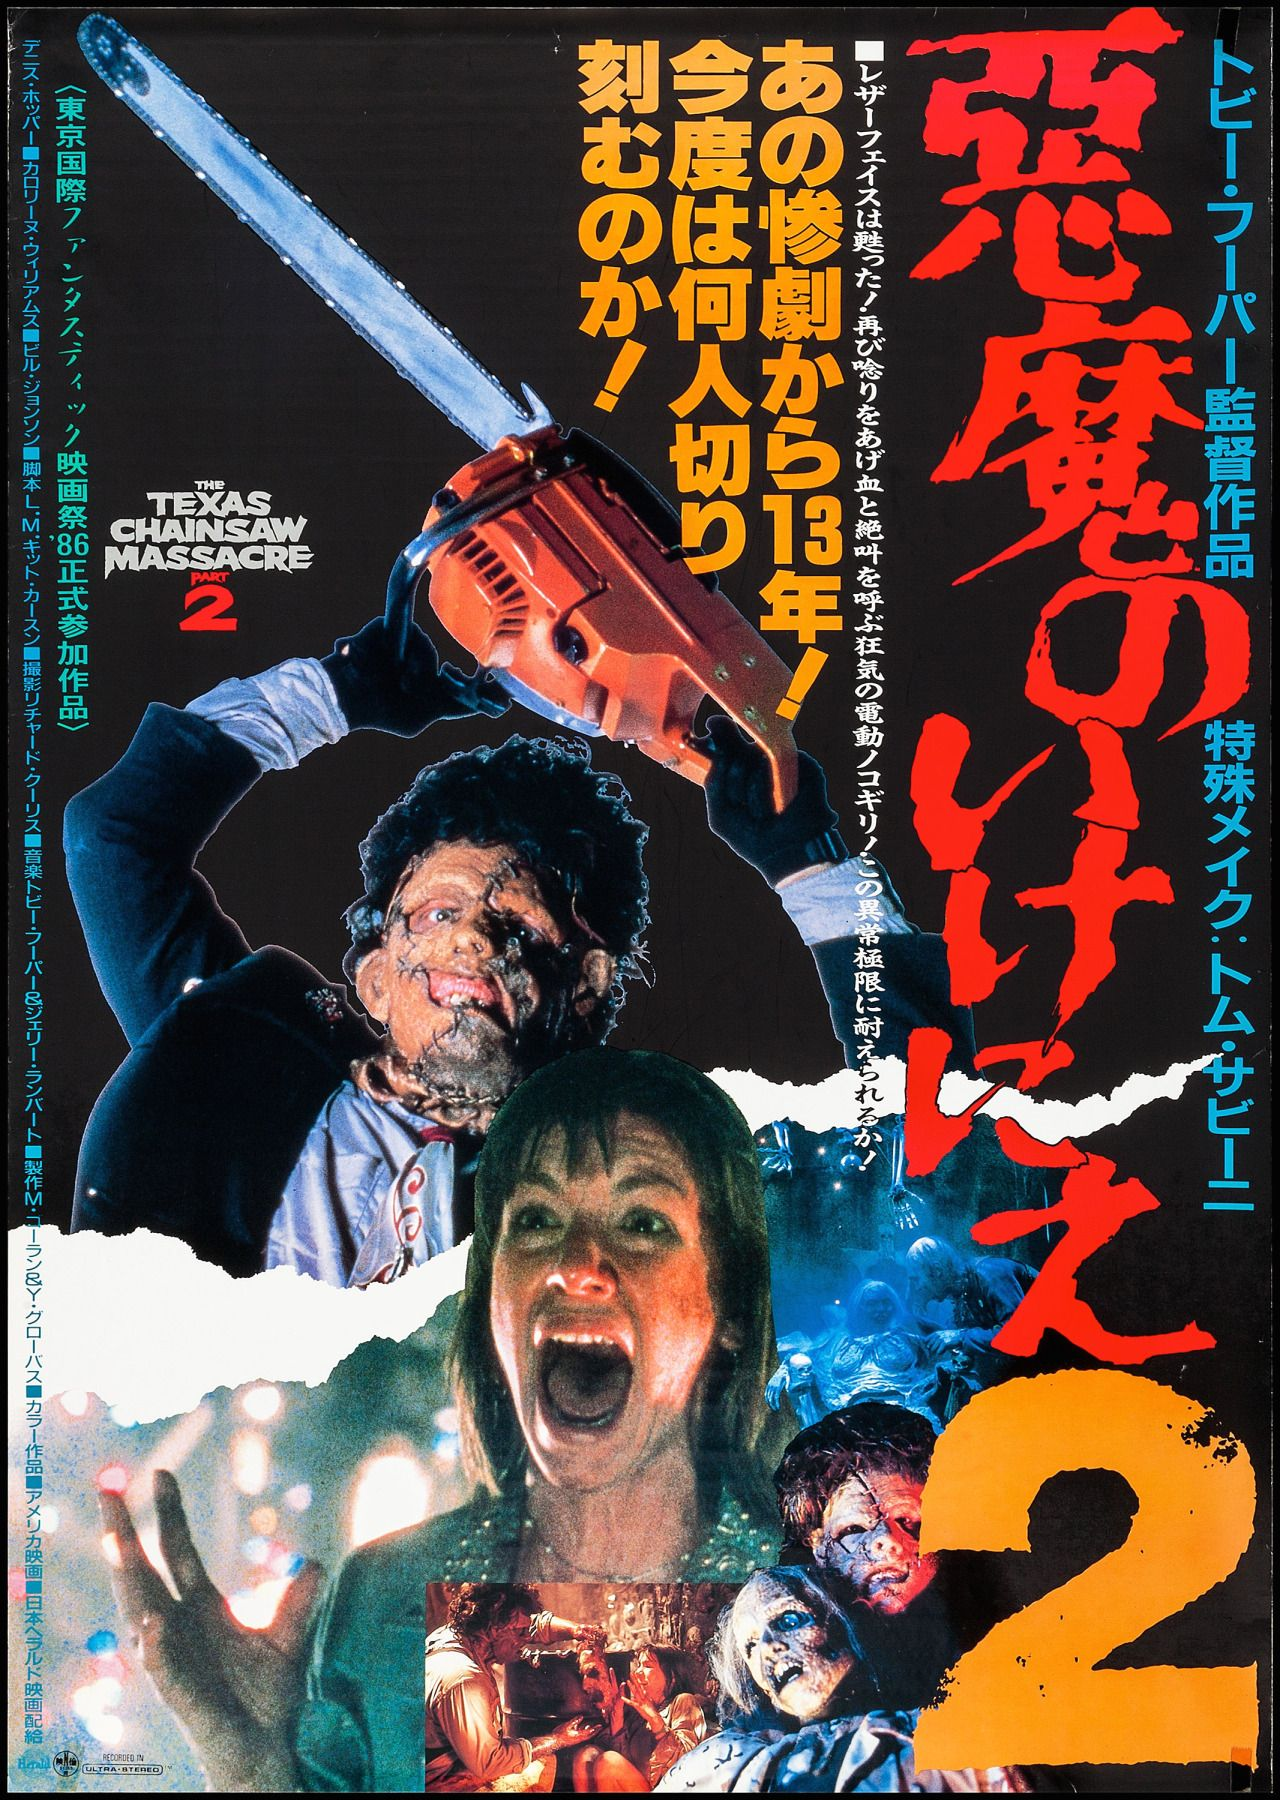 046345946a9 The Texas Chainsaw Massacre 2 (Japan)